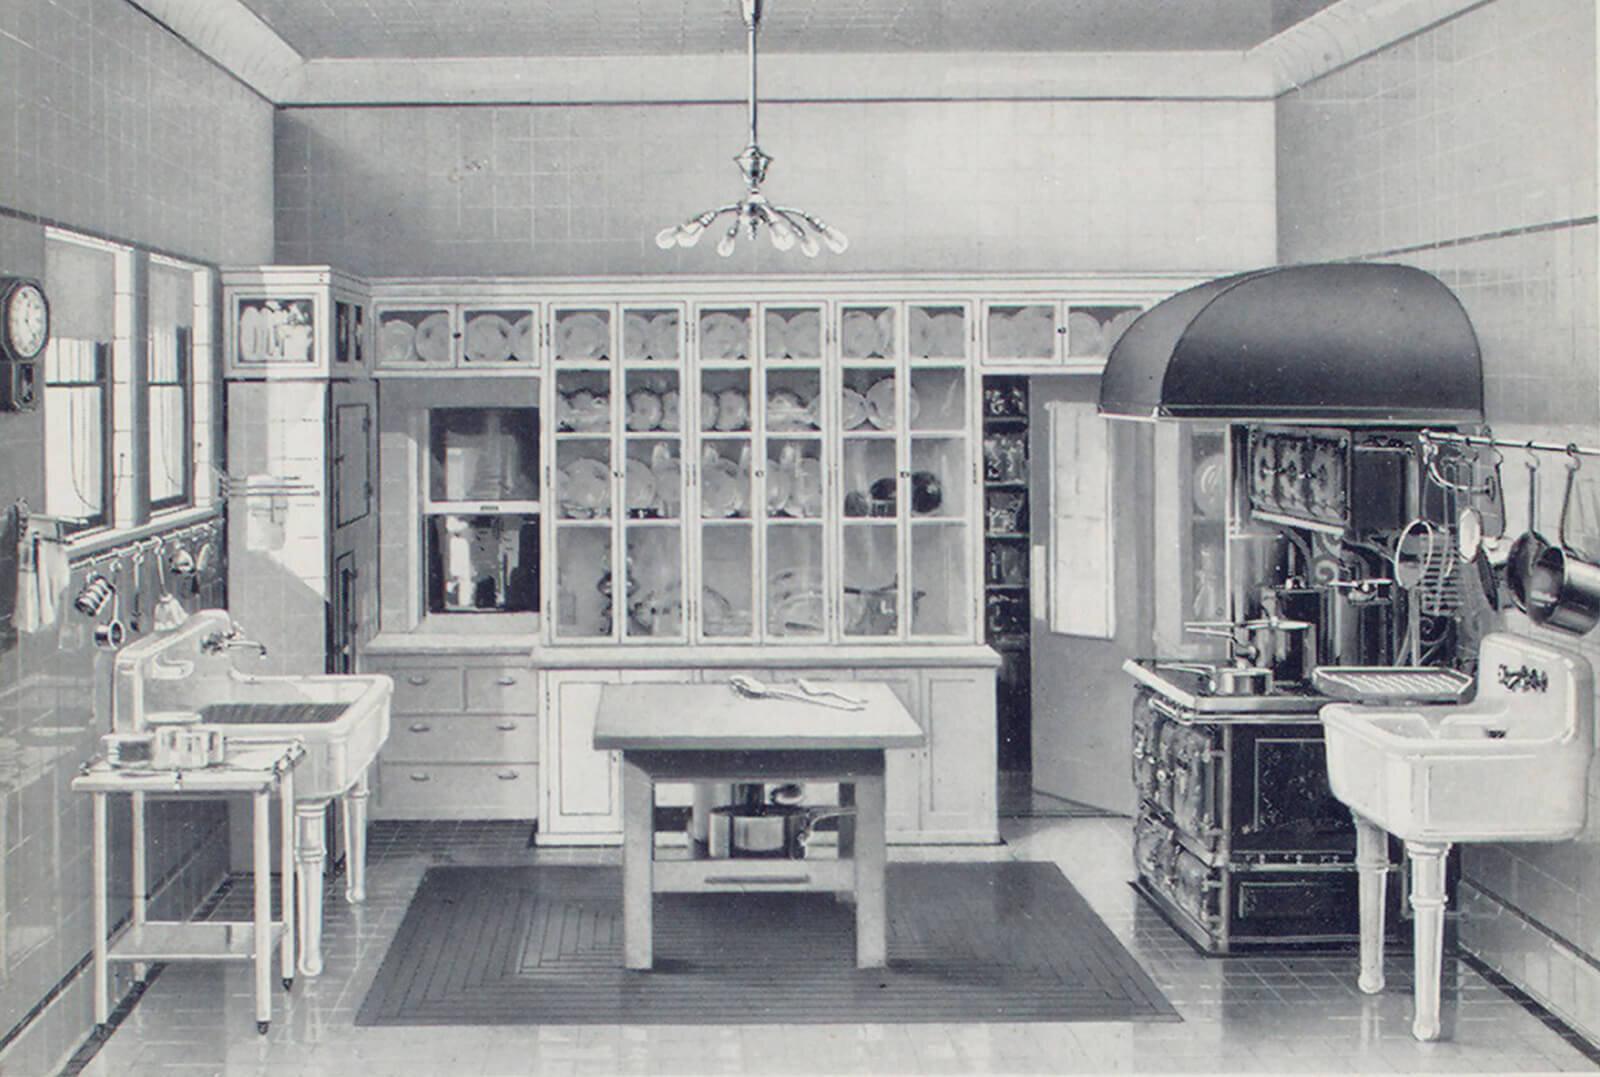 Image from JL Mott Plumbing catalog circa 1911.